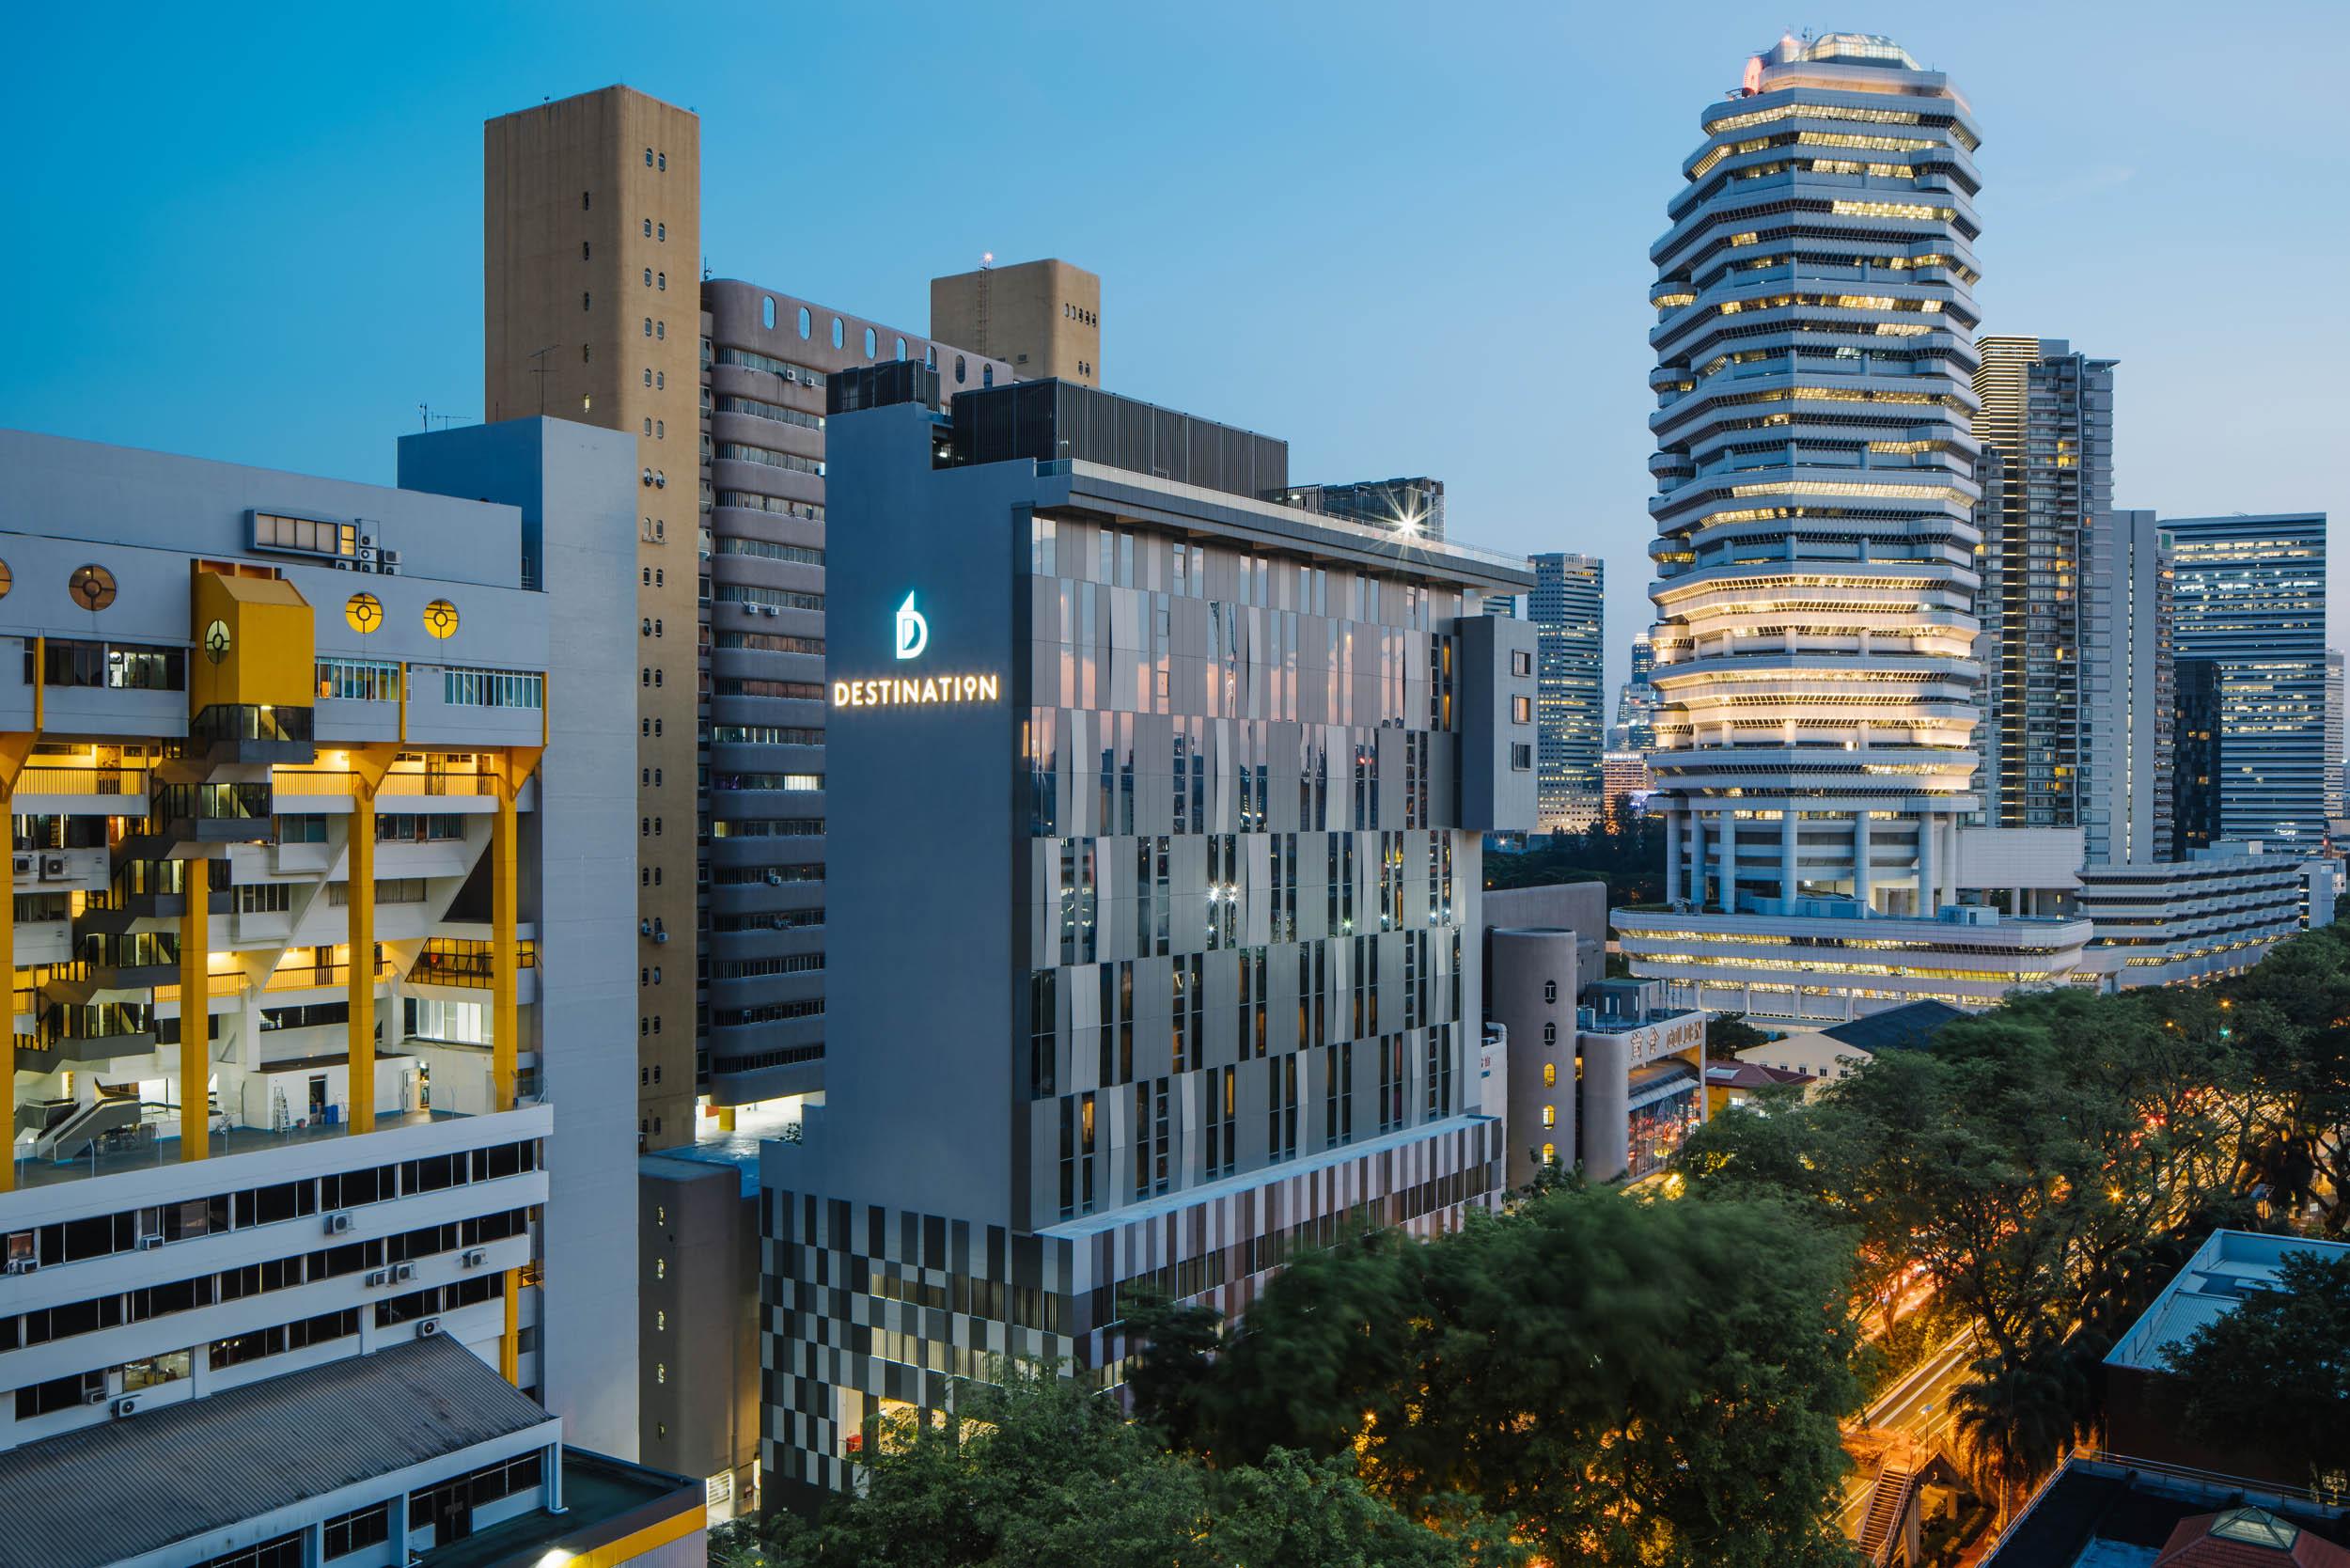 Client  Destination Hotel  Project  Destination Hotel  Location  Singapore  Year  2017